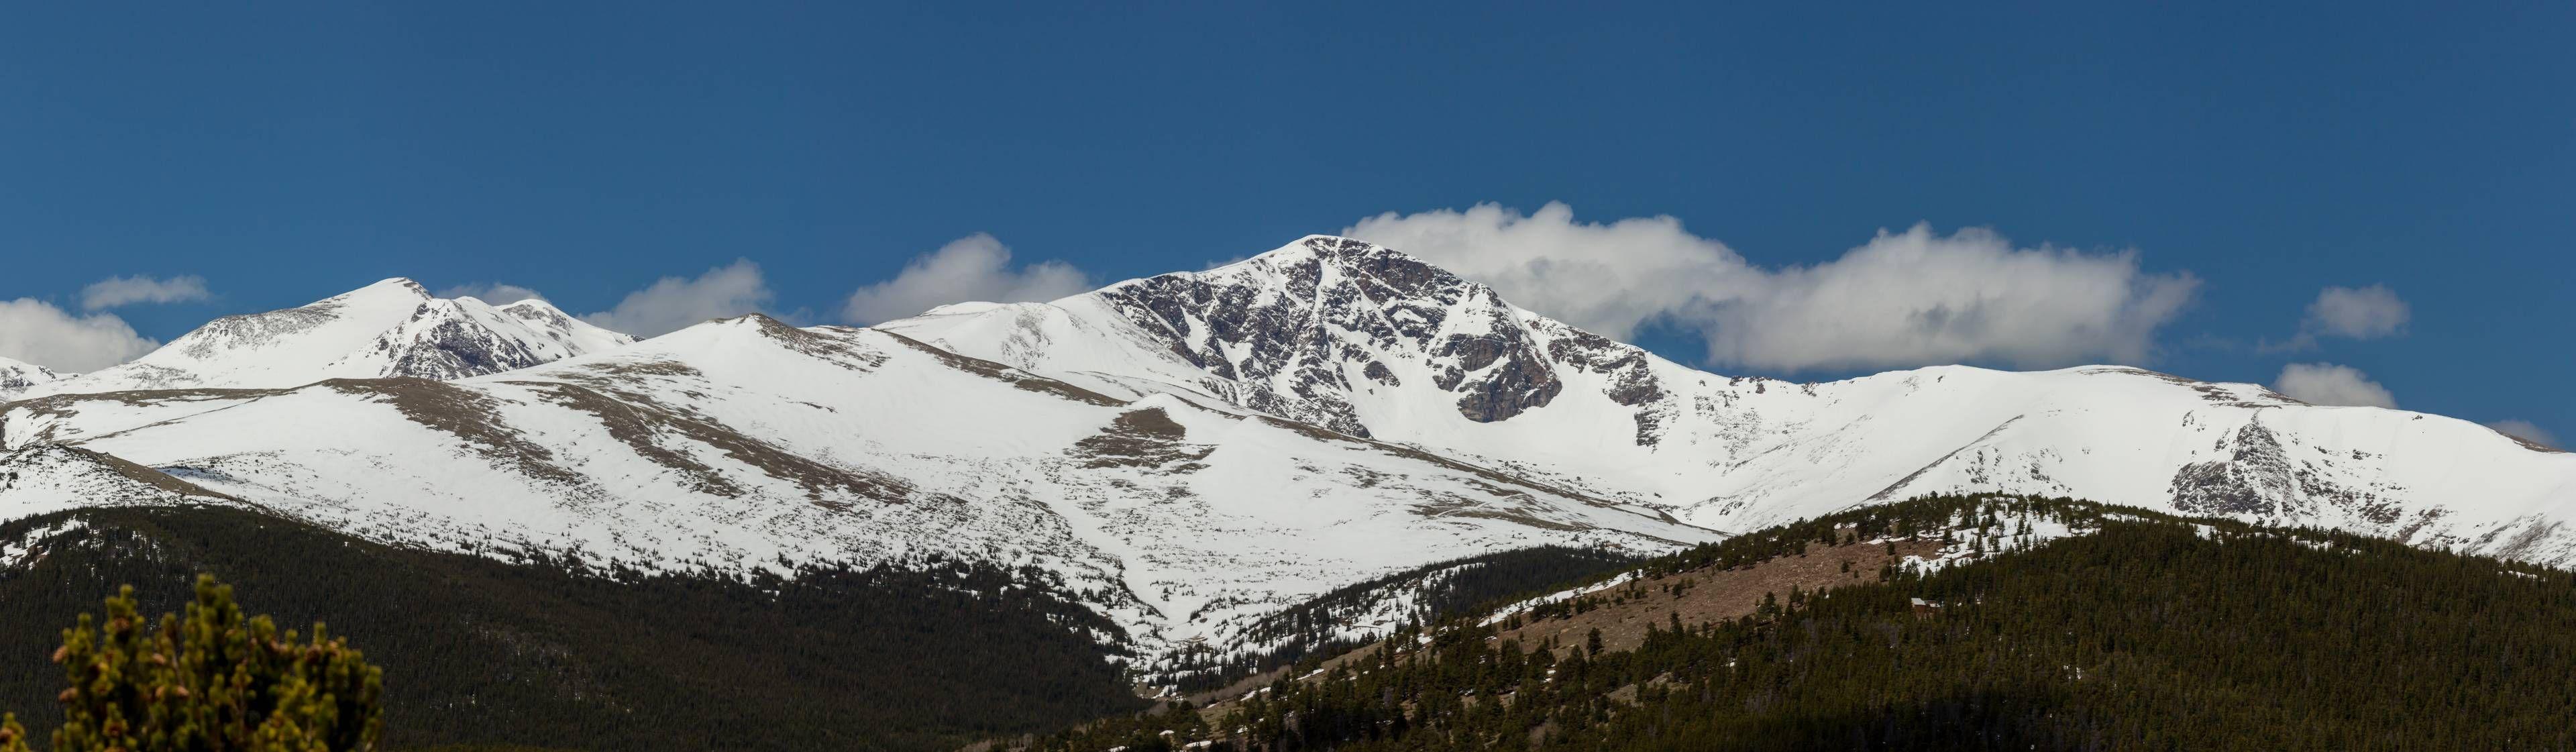 James Peak CO. [3840x1121] [OC]